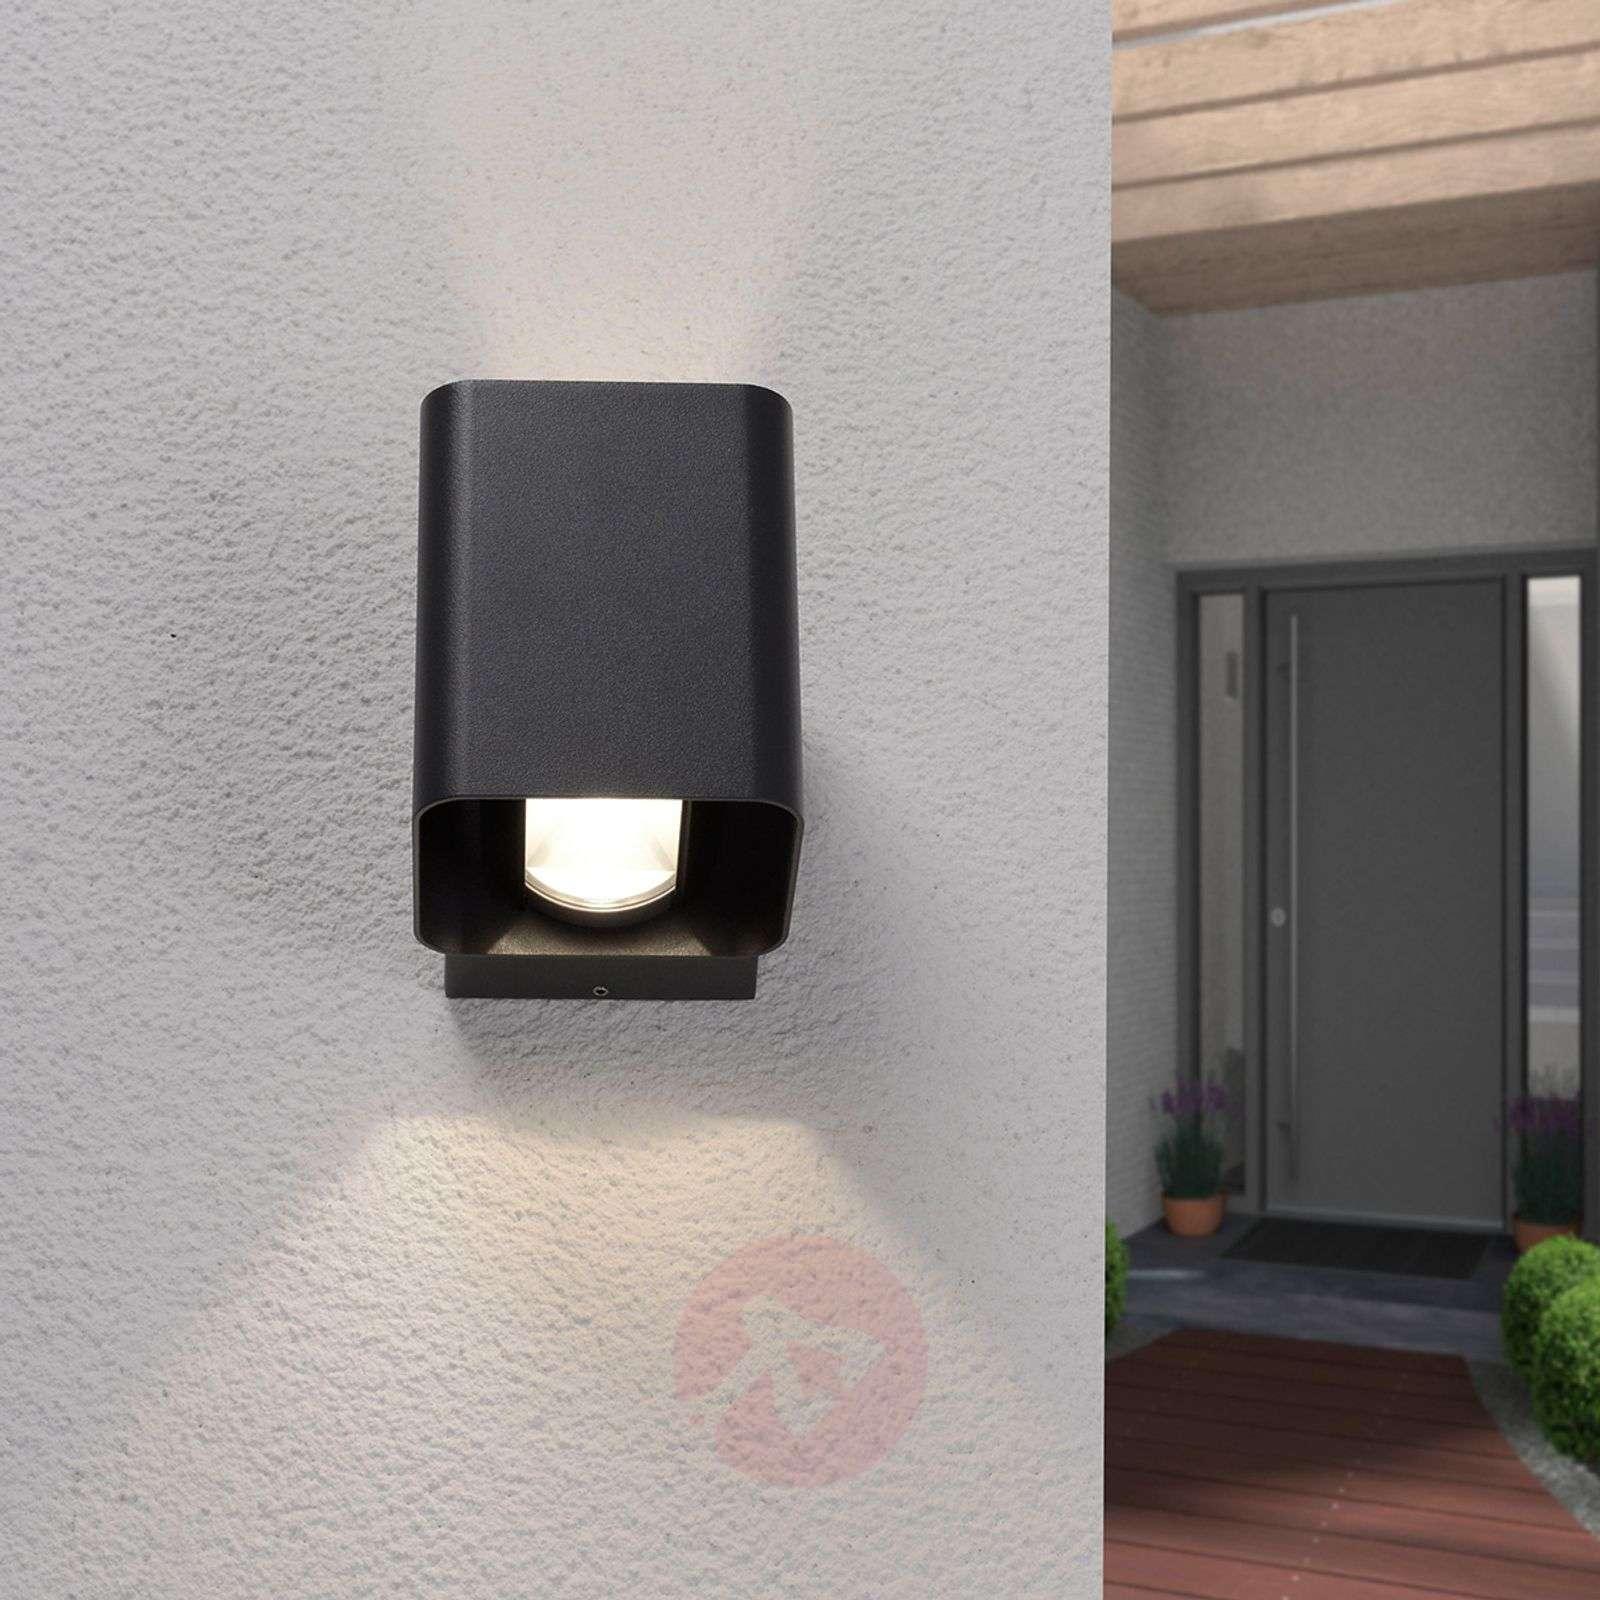 LED outdoor wall light Nikolas-9618062-01